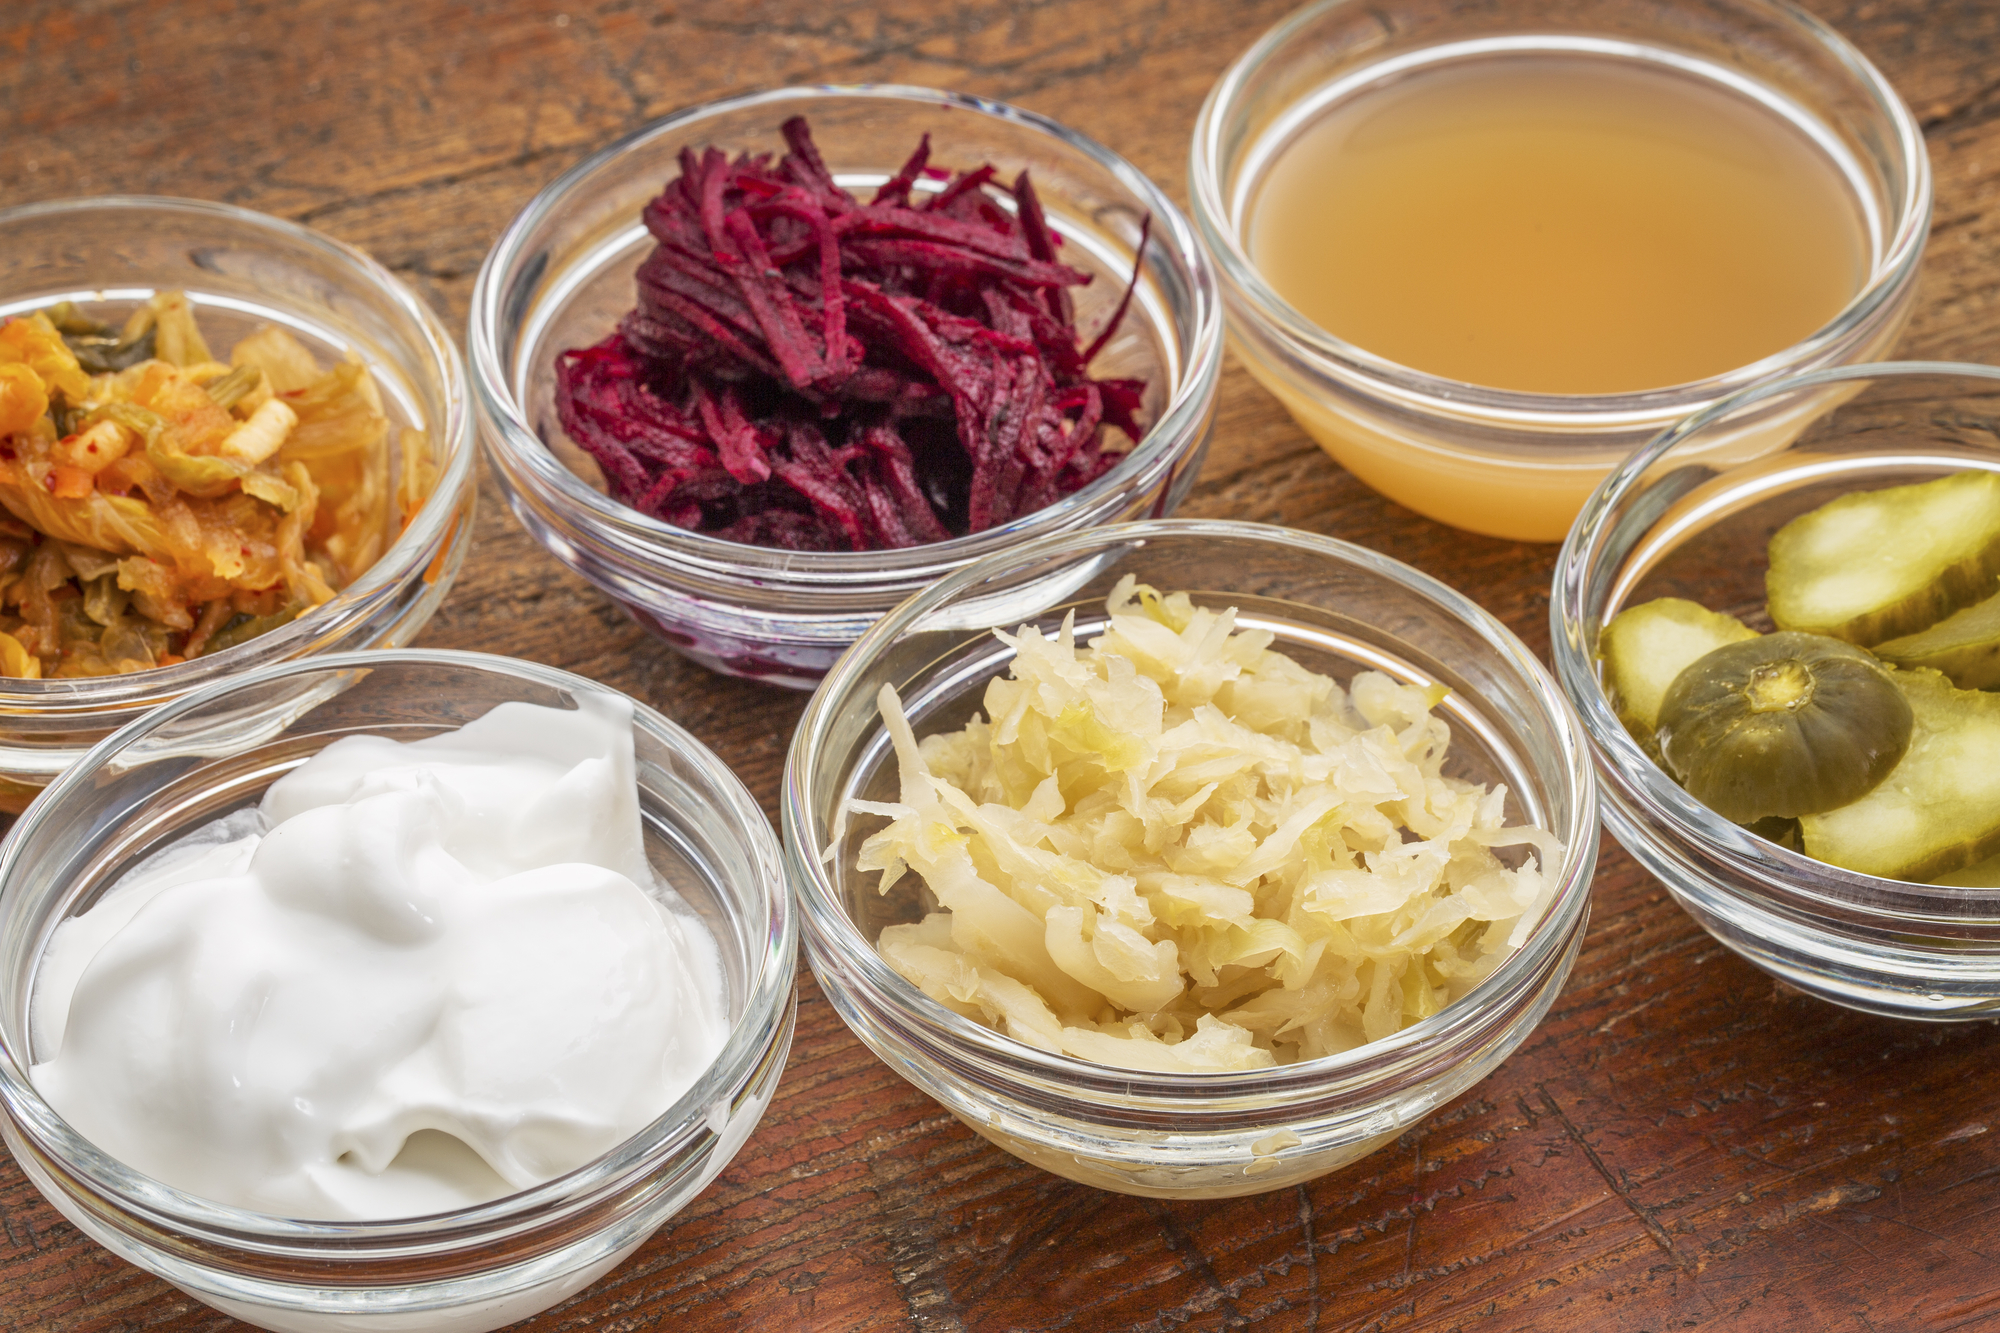 a sampler of fermented food great for gut health - glass bowls against wood: kimchi, red beets, apple cider vinegar, coconut milk yogurt, cucumber pickles, sauerkraut